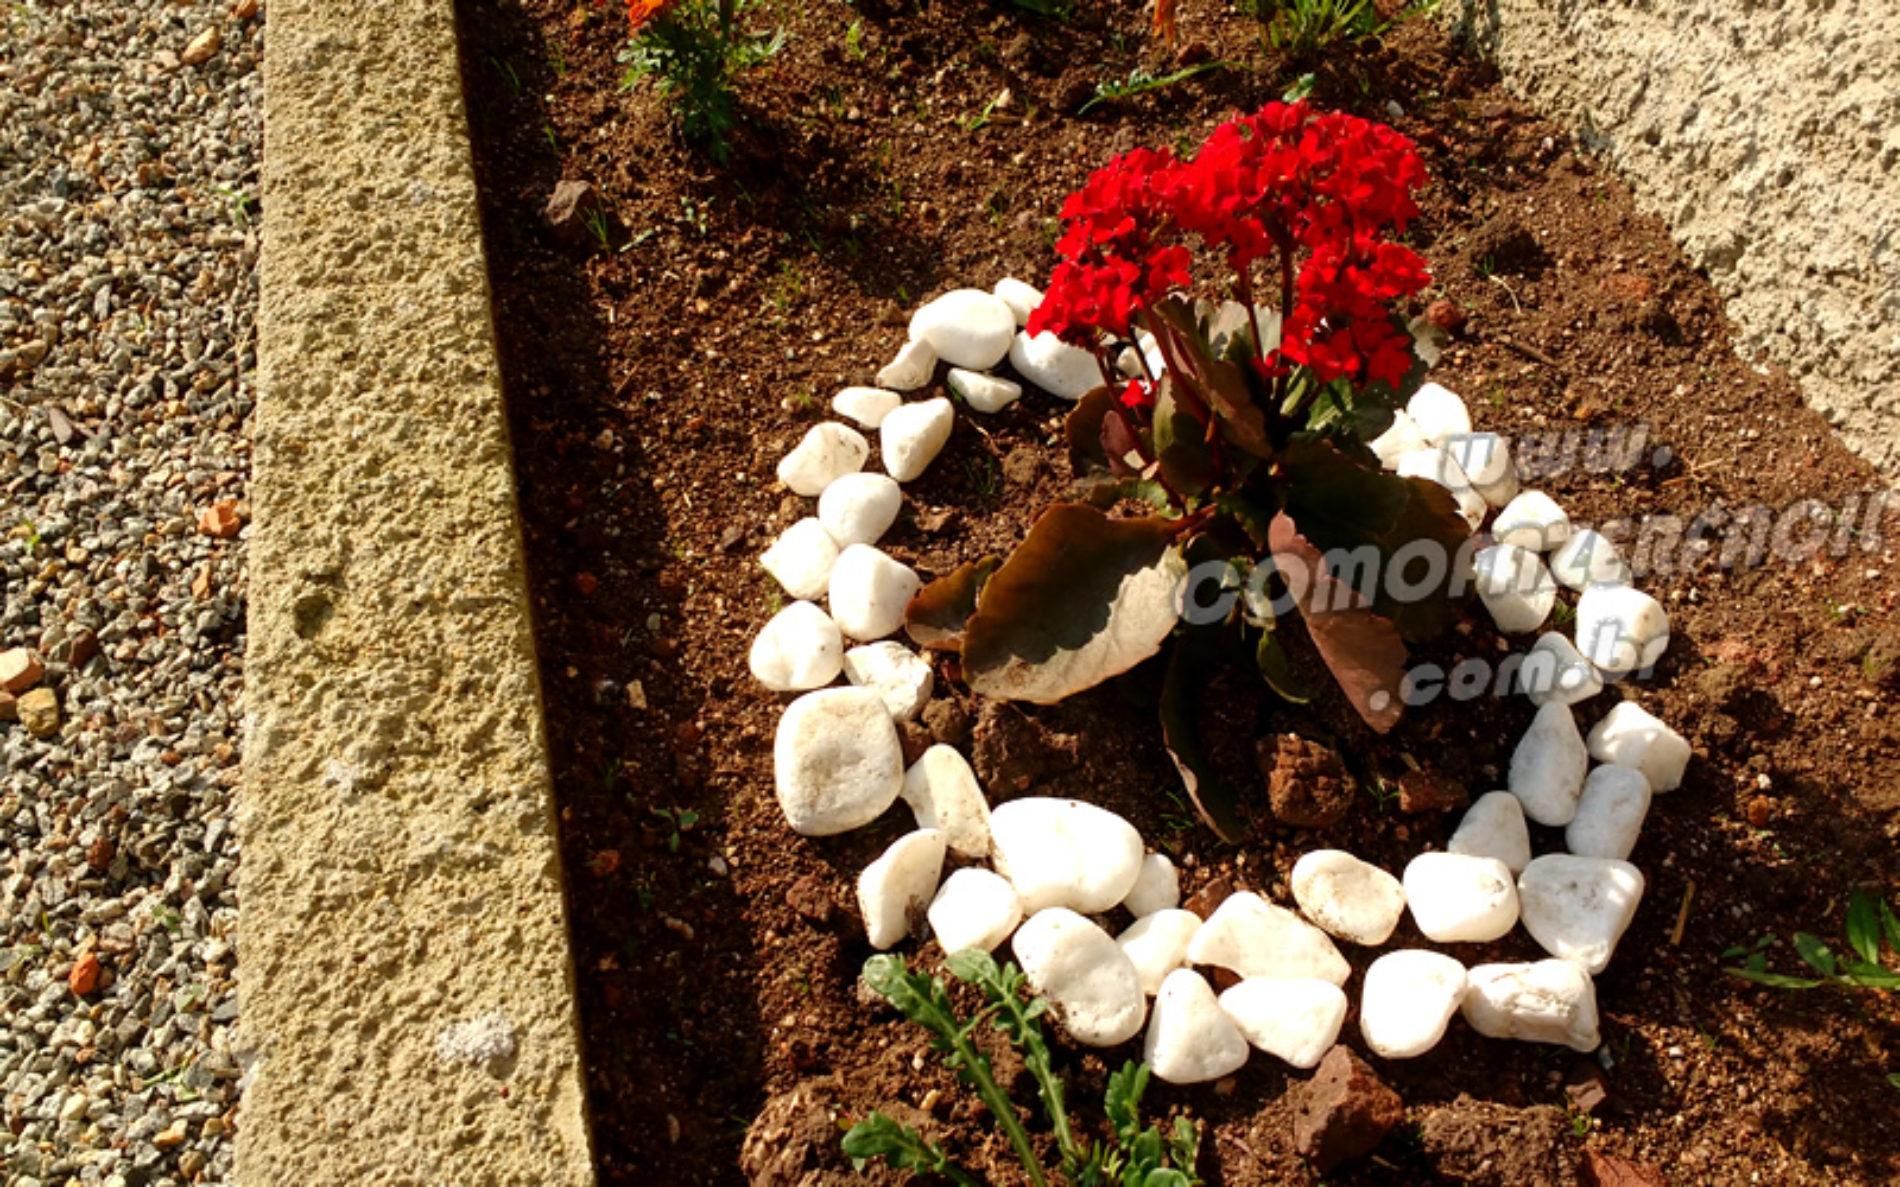 Floricultura: Como limpar seixos/pedras brancas facilmente